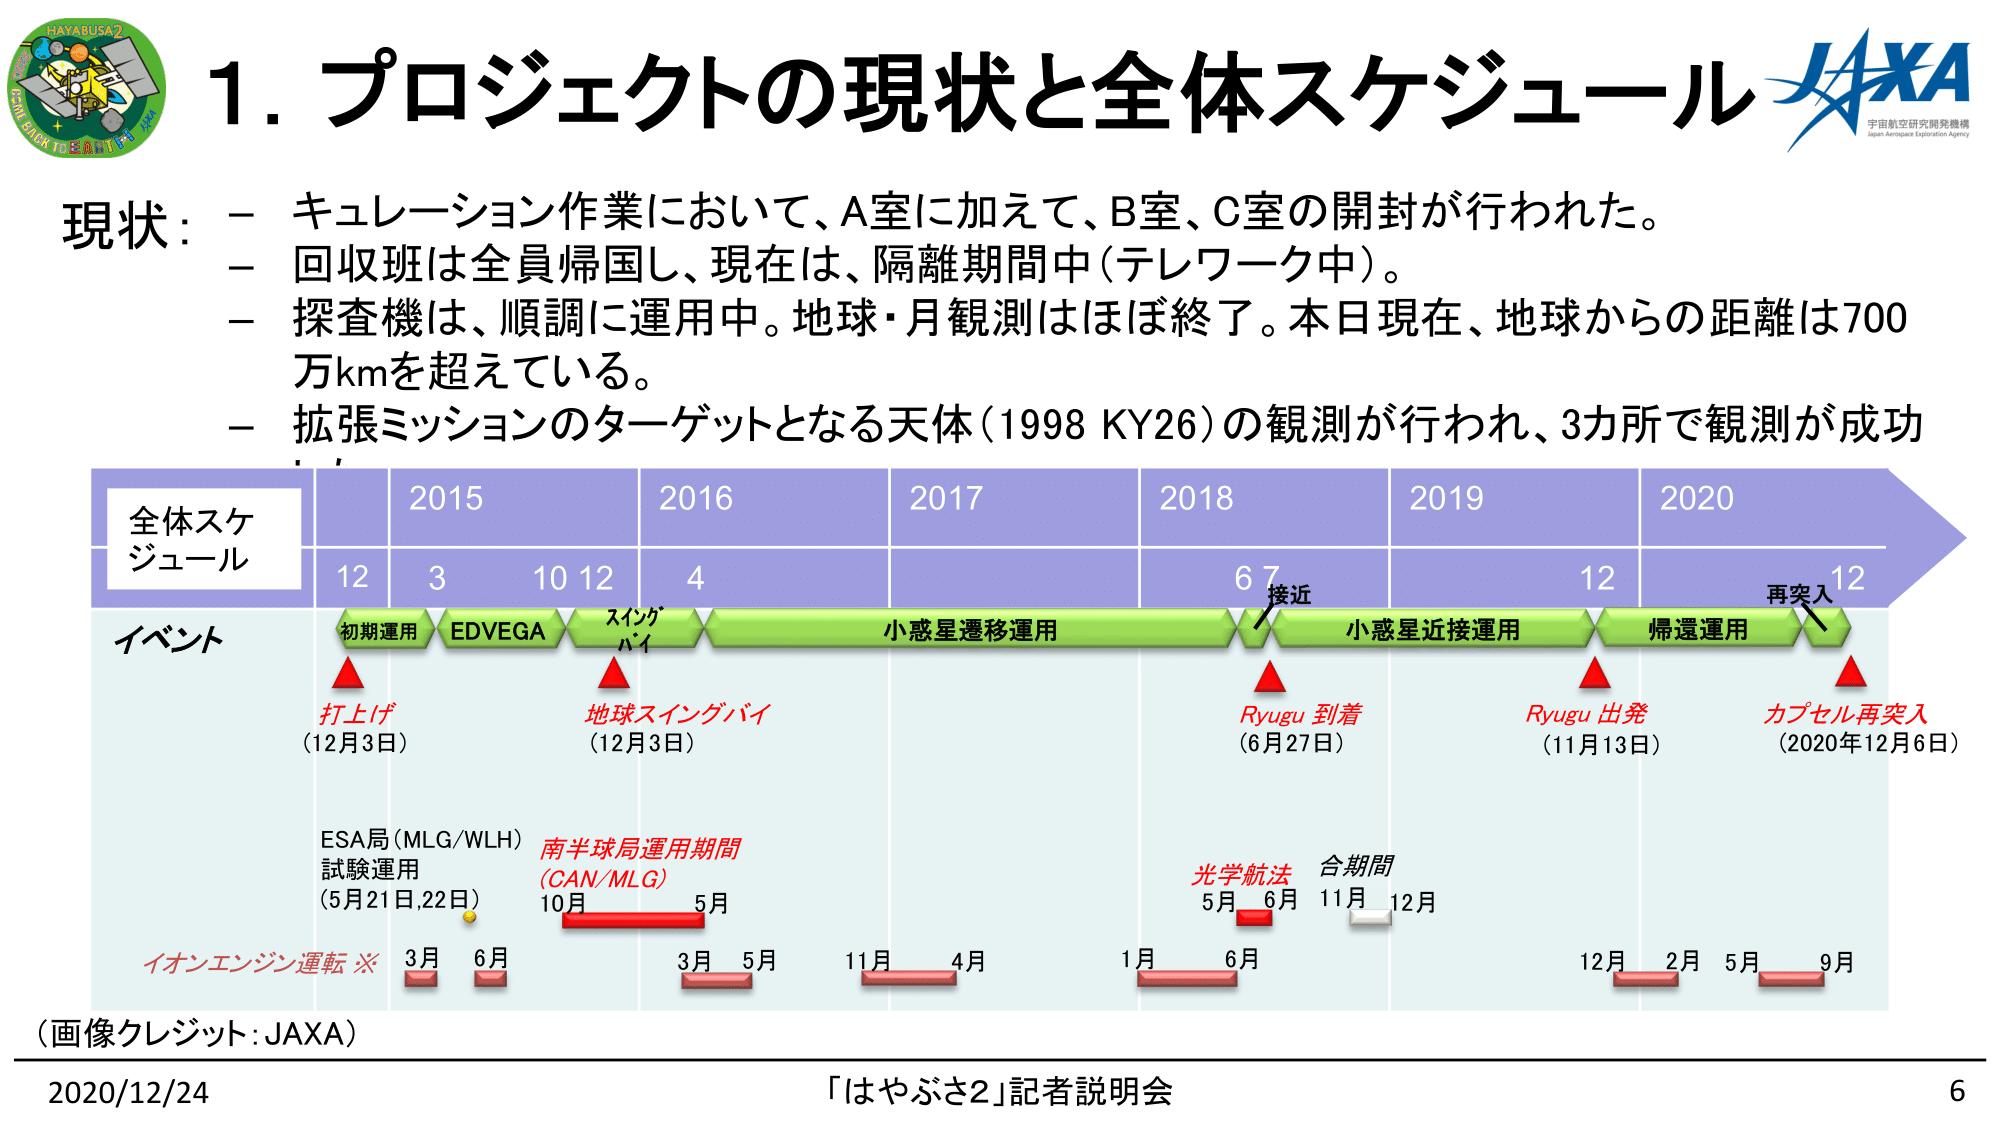 f:id:Imamura:20201224135014p:plain